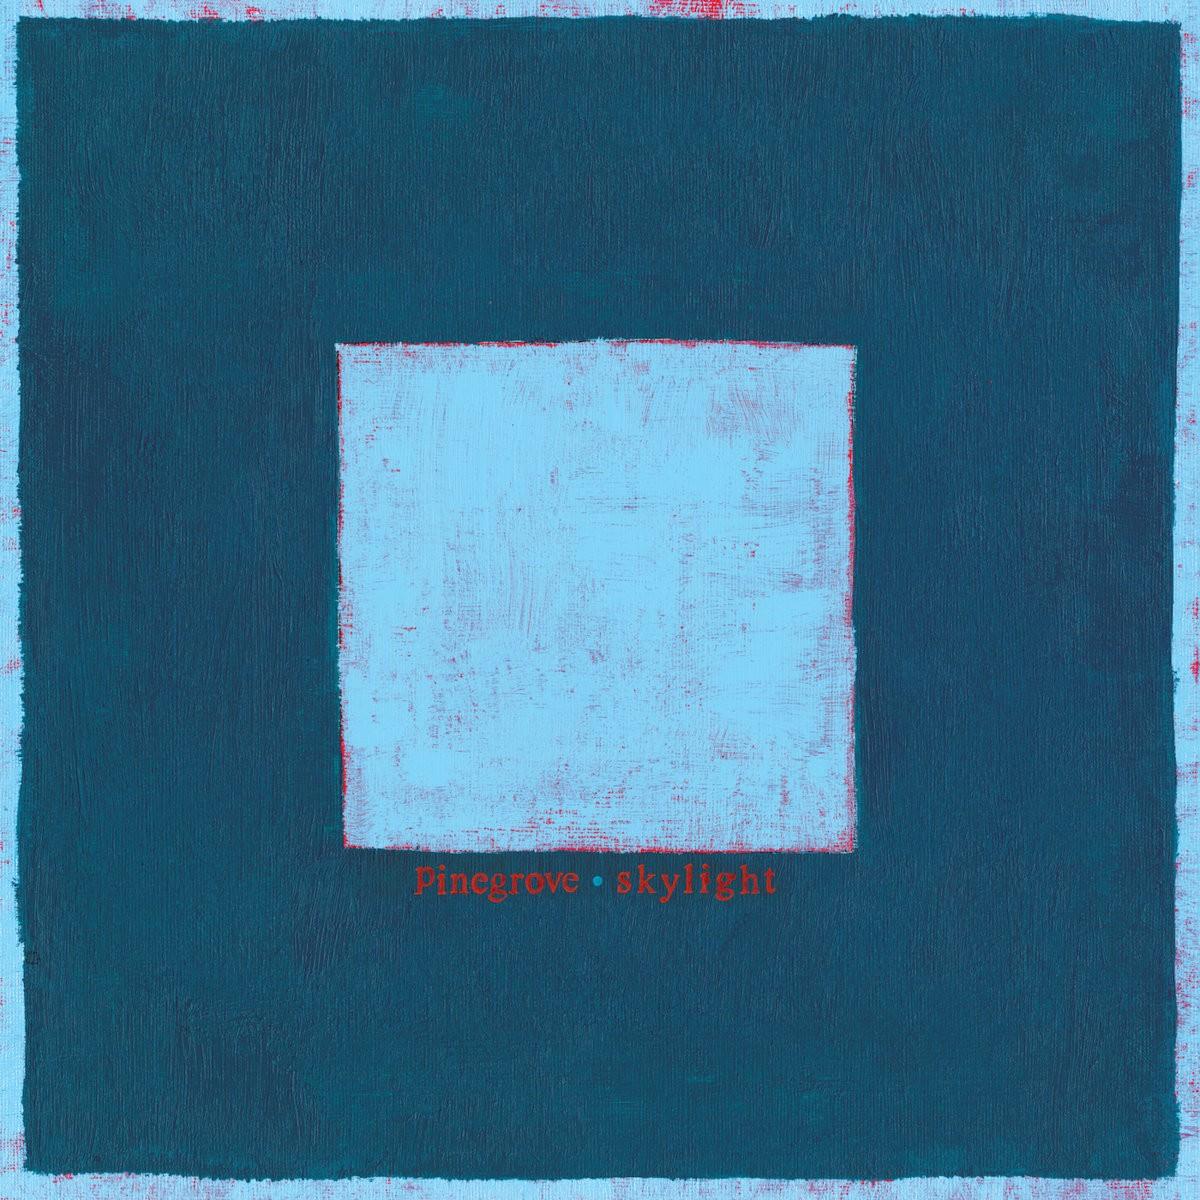 pinegrove skylight album review